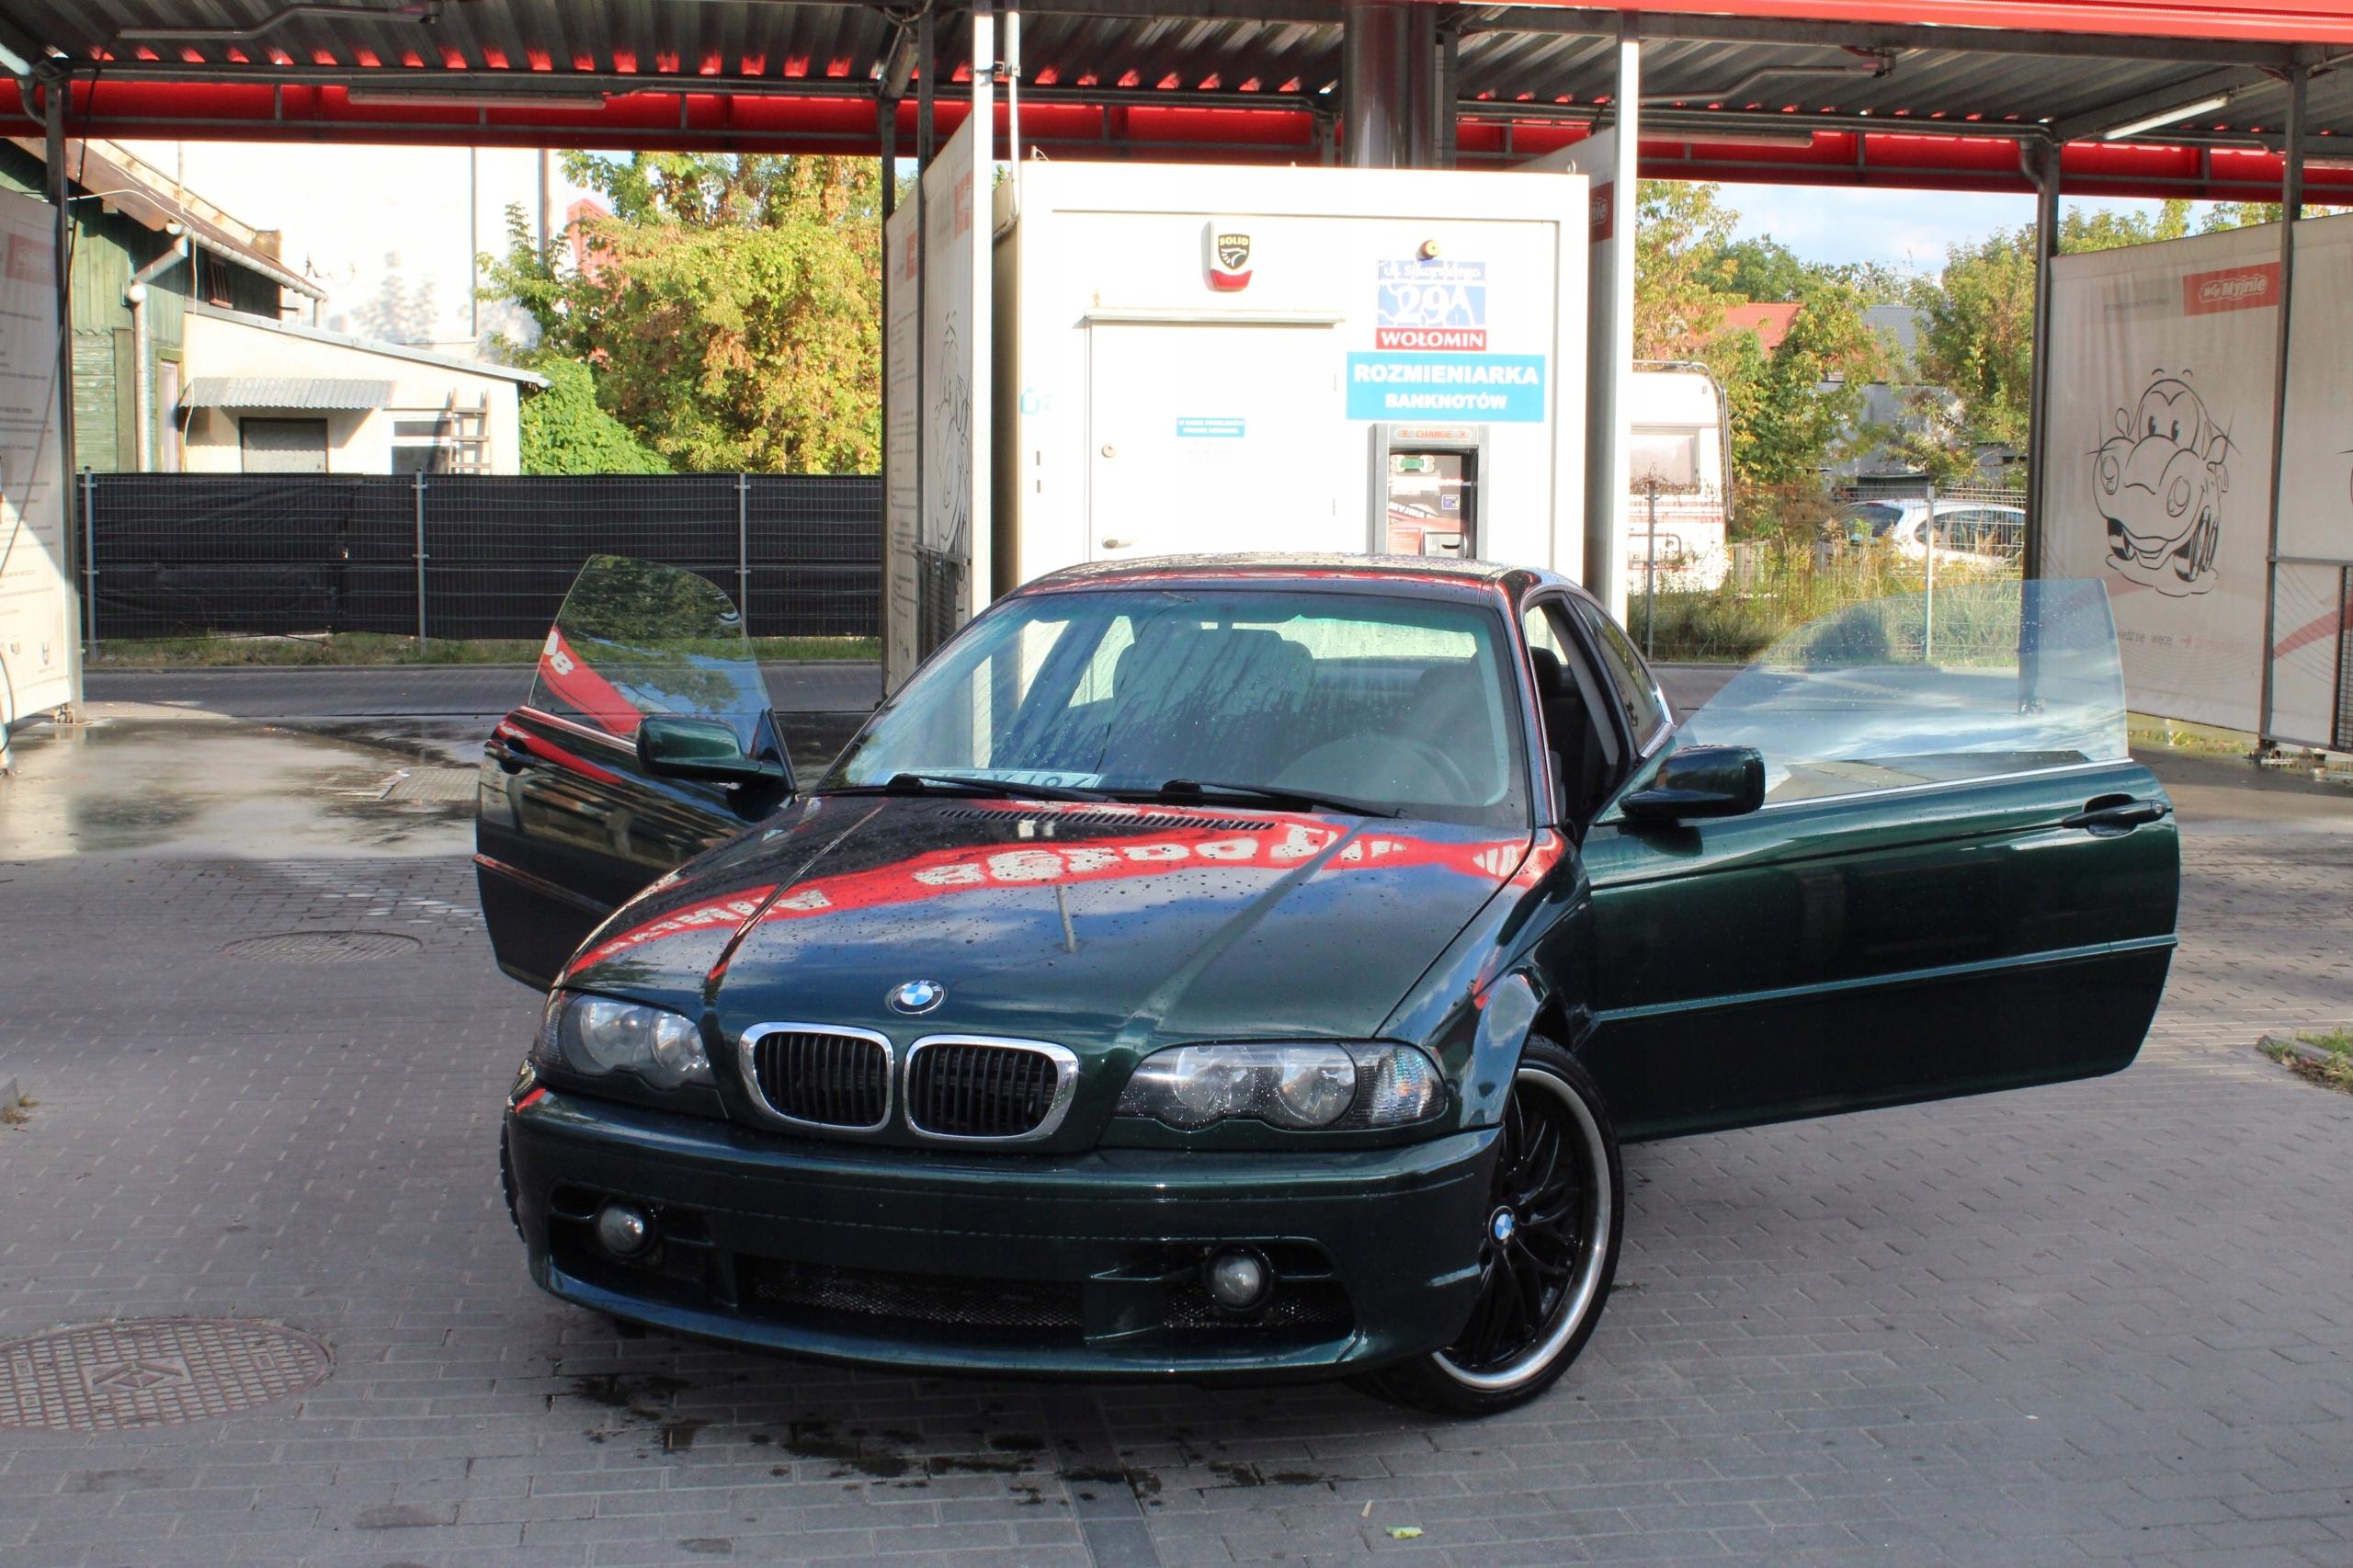 8ac977000 BMW E46 323i Coupe Aero - 7601895432 - oficjalne archiwum allegro